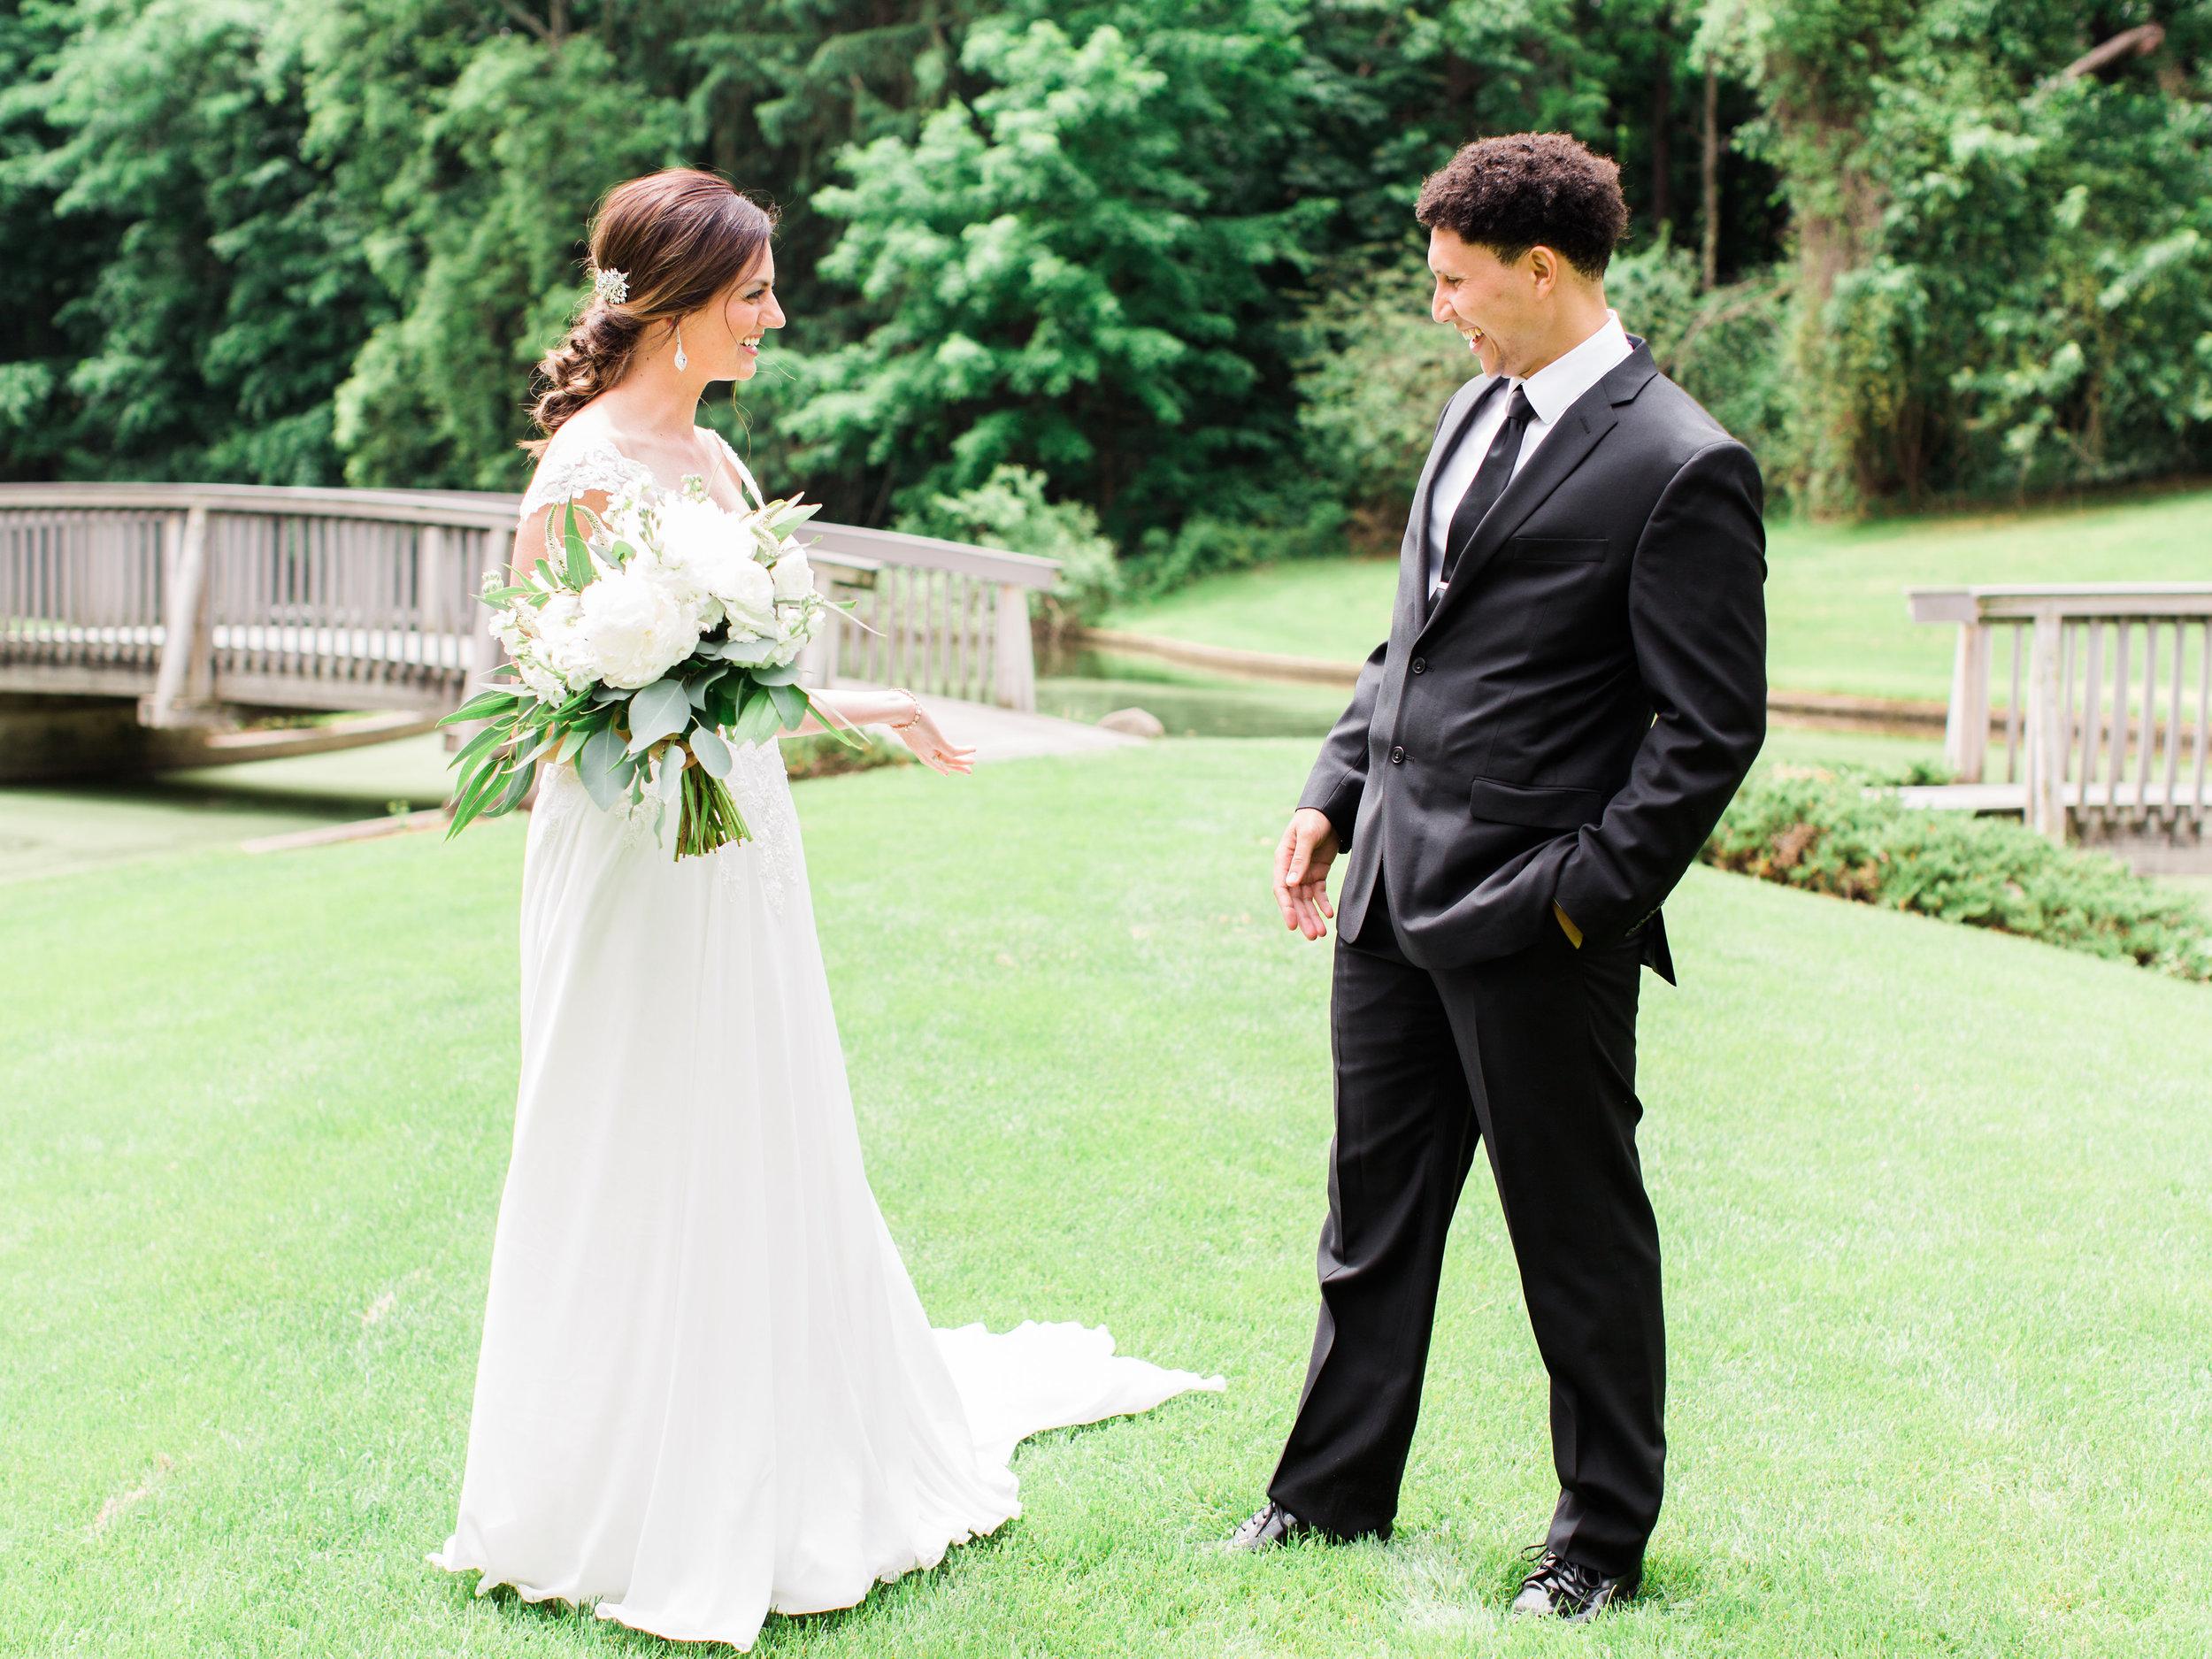 Julius+Wedding+FirstLook-9.jpg